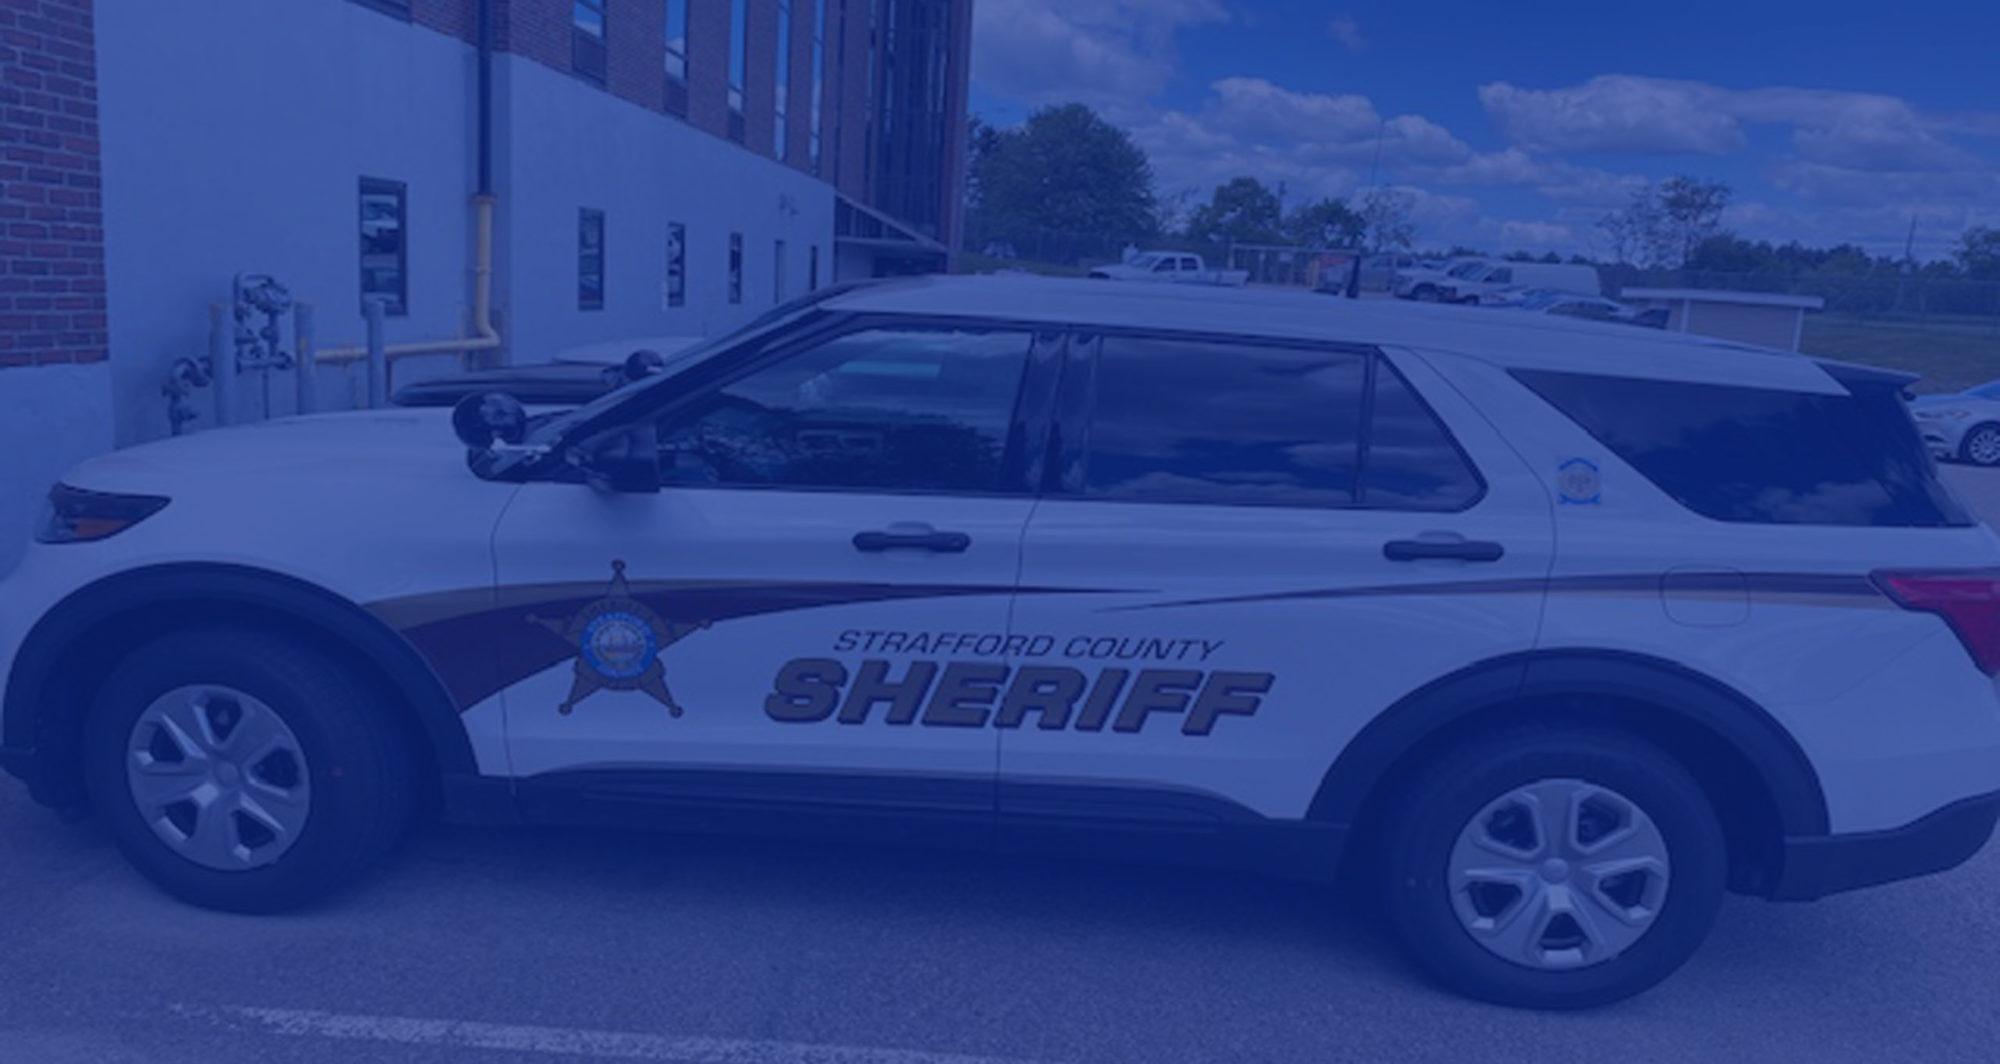 Strafford County Sheriff's Office